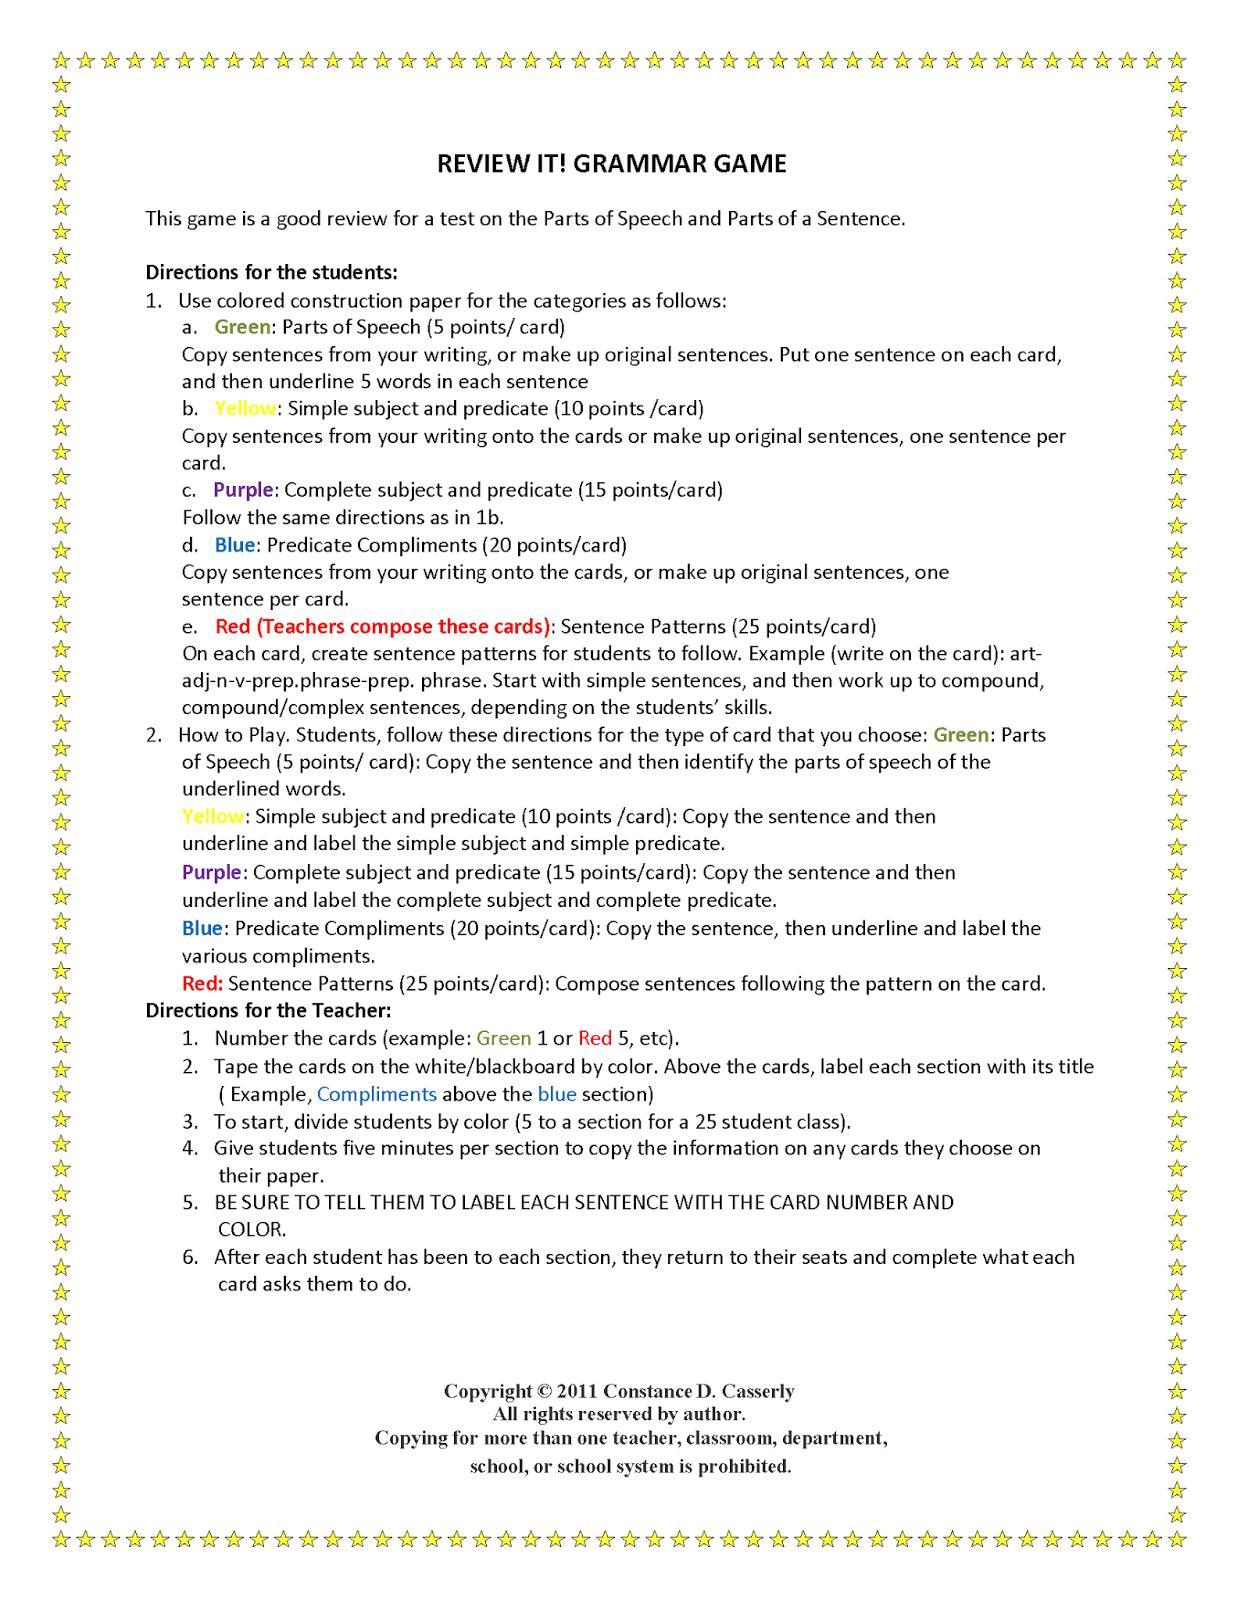 Worksheets Pages : Grammar Activities Worksheets High School Kids - Free Printable Grammar Worksheets For Highschool Students